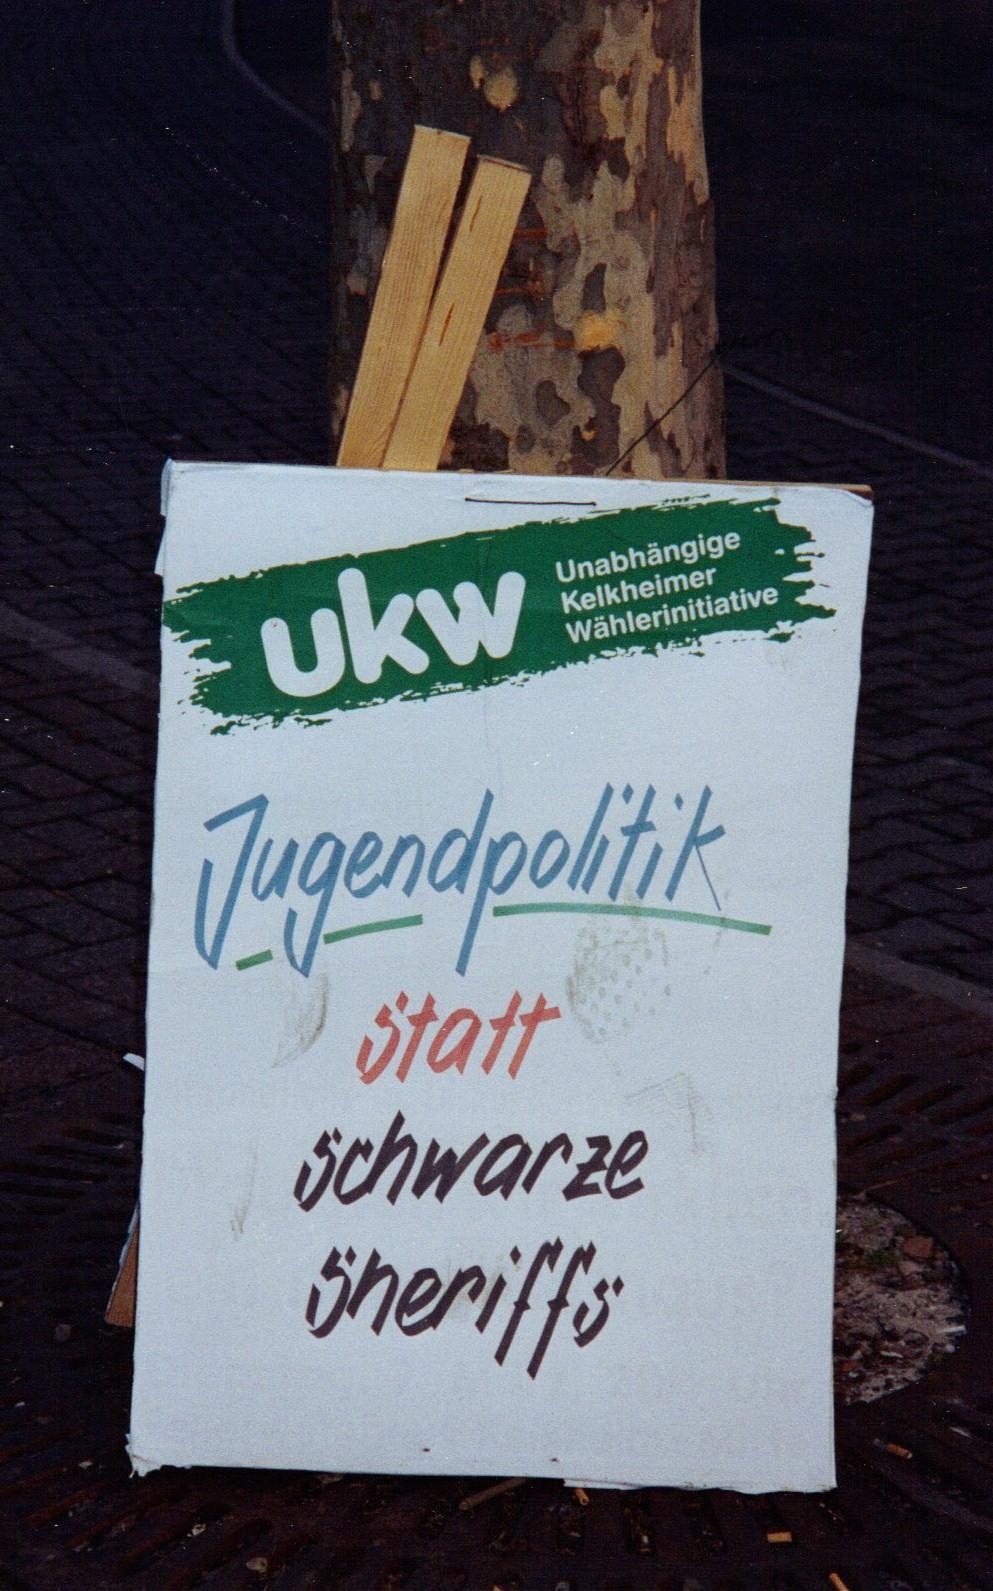 2006 Plakat zur Jugendpolitik